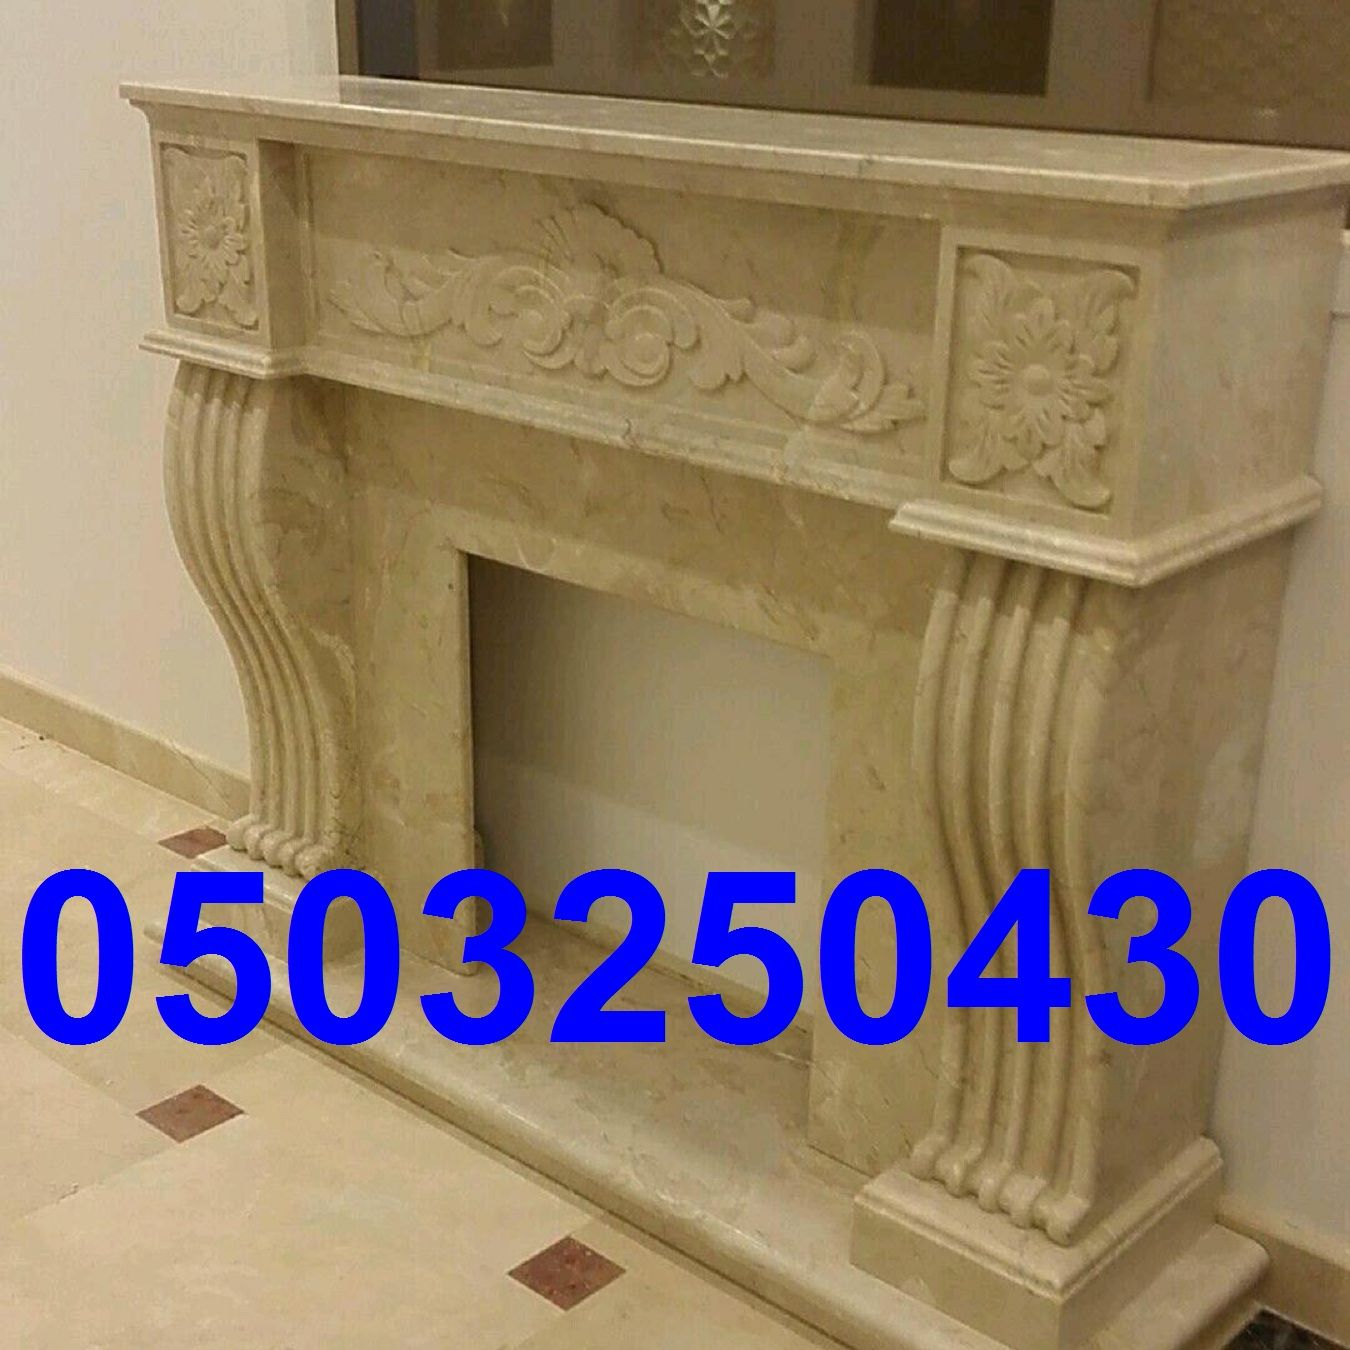 مدافئ مدافئ امريكيا مدافئ تركيا مدافئ السبق مدافئ ساكو Home Decor Decor Fireplace